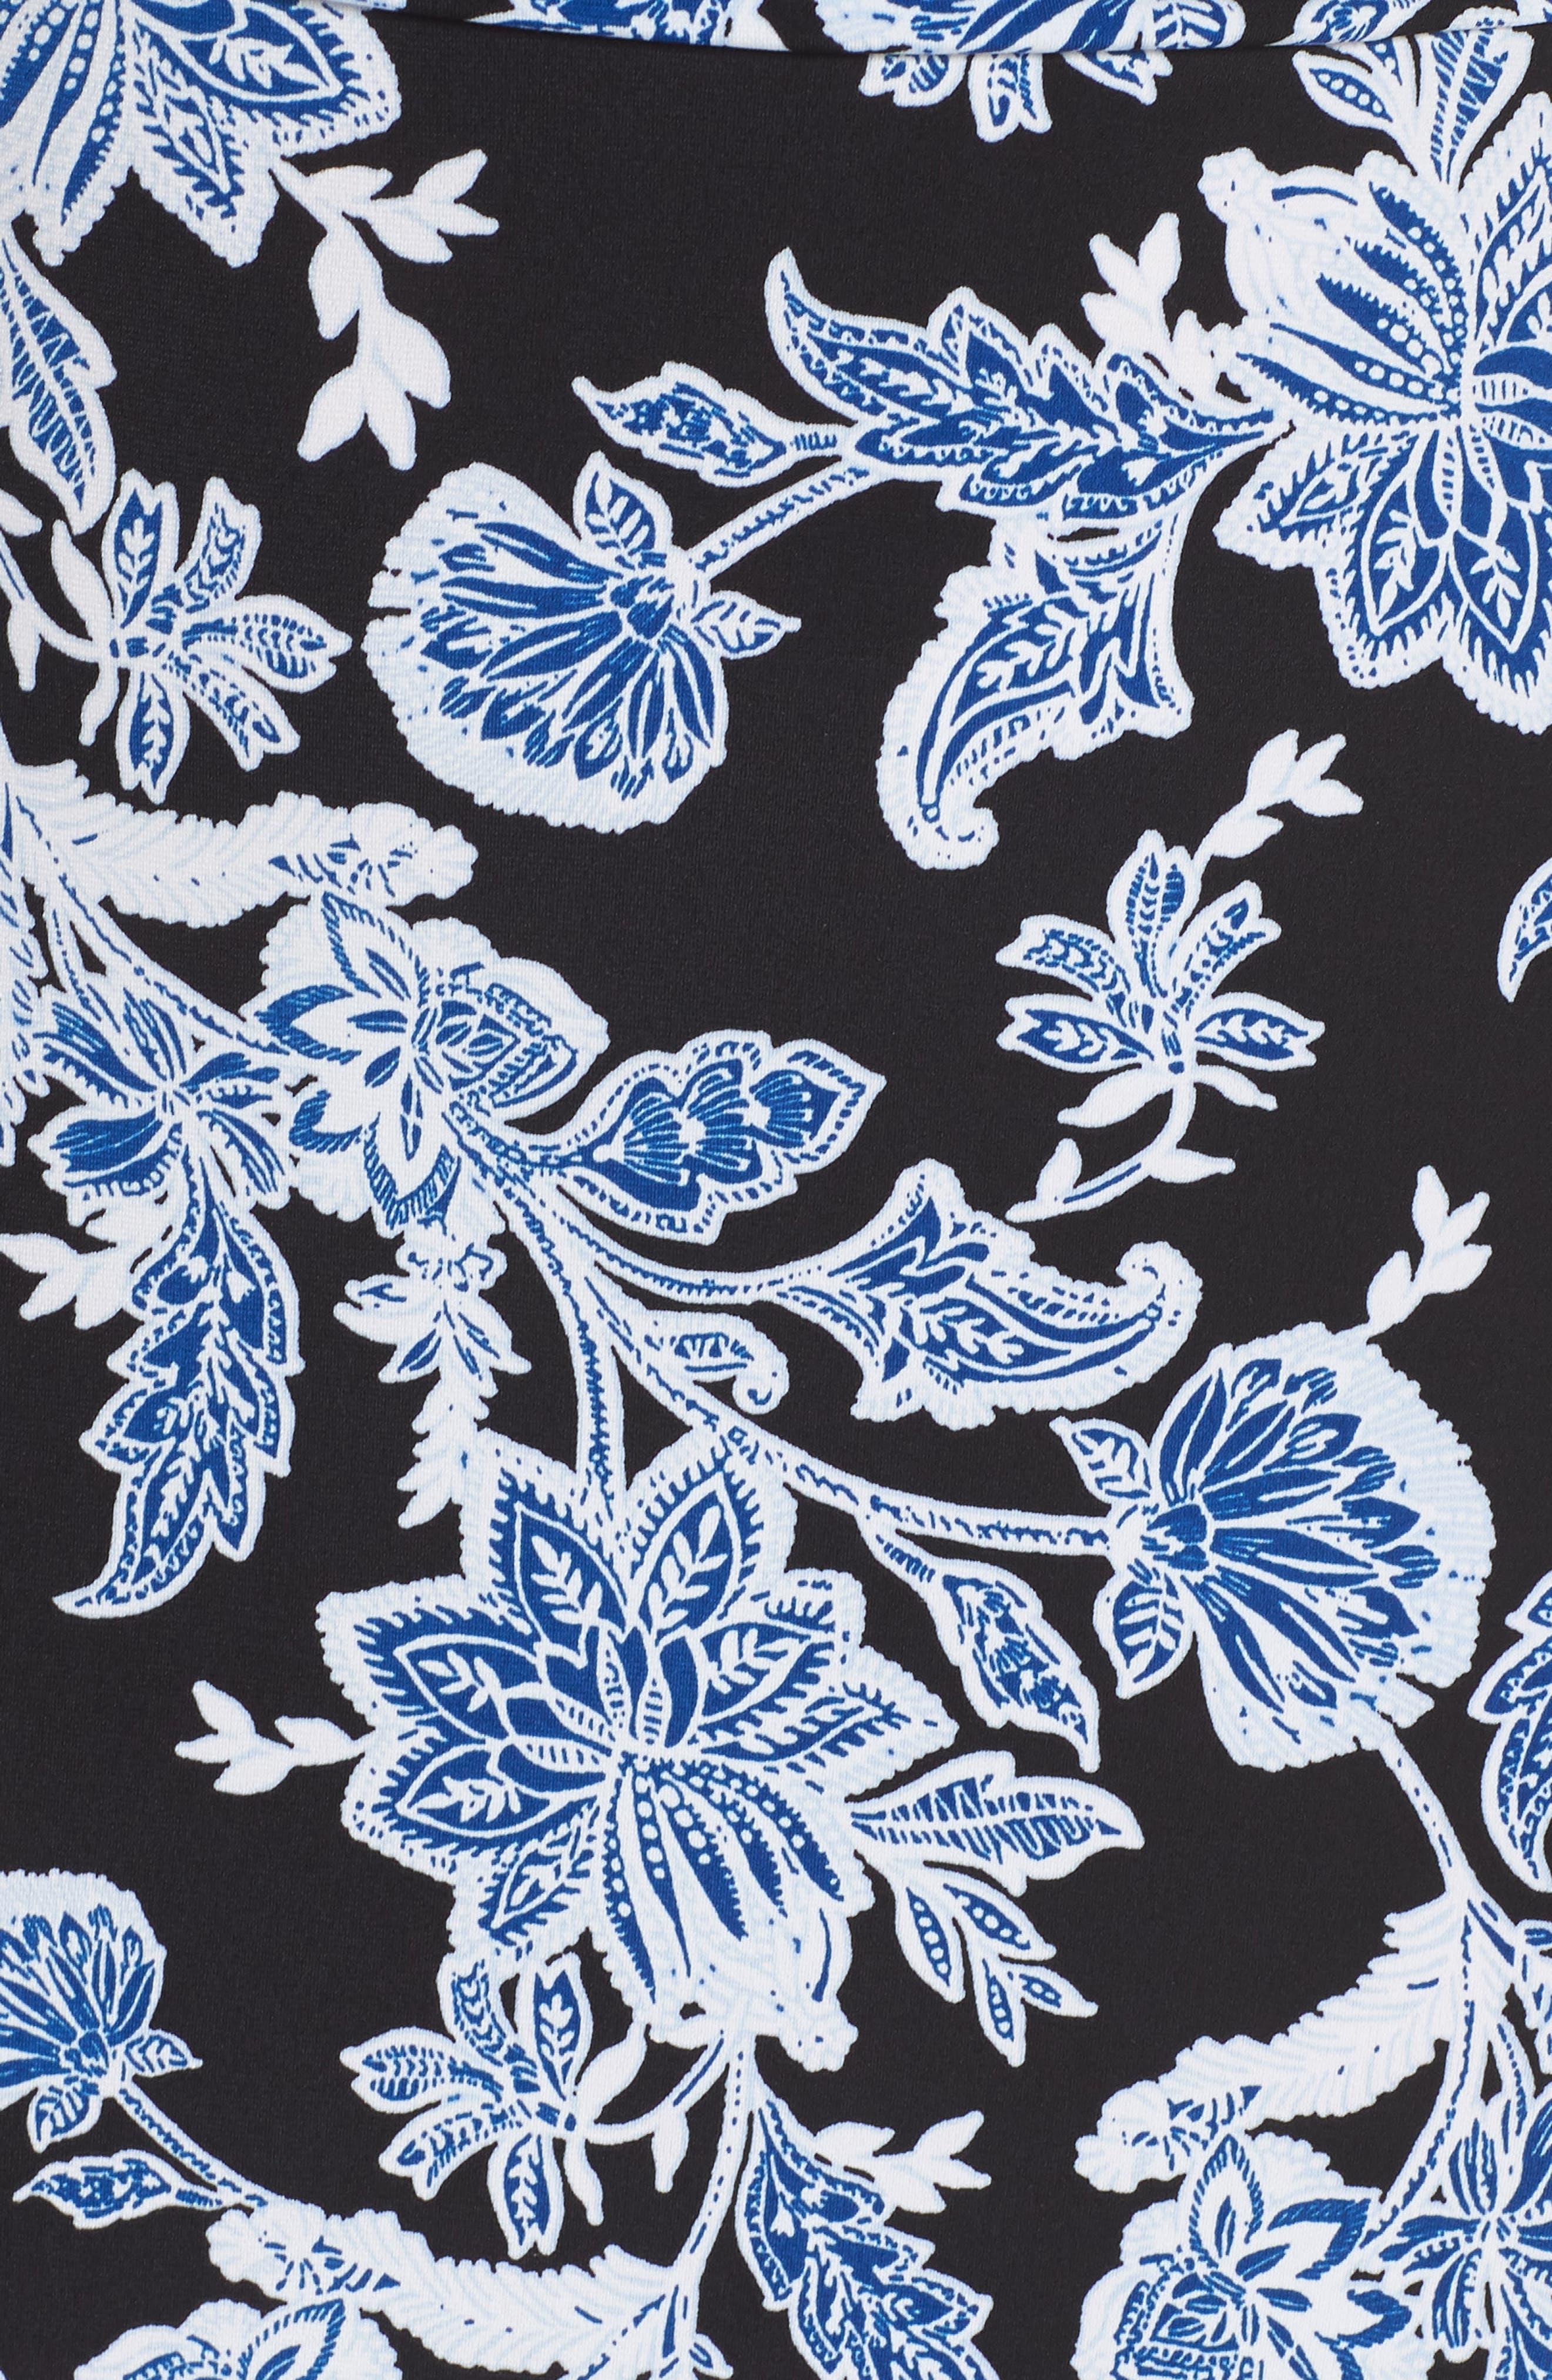 Woodblock Floral Maxi Dress,                             Alternate thumbnail 6, color,                             Rich Black